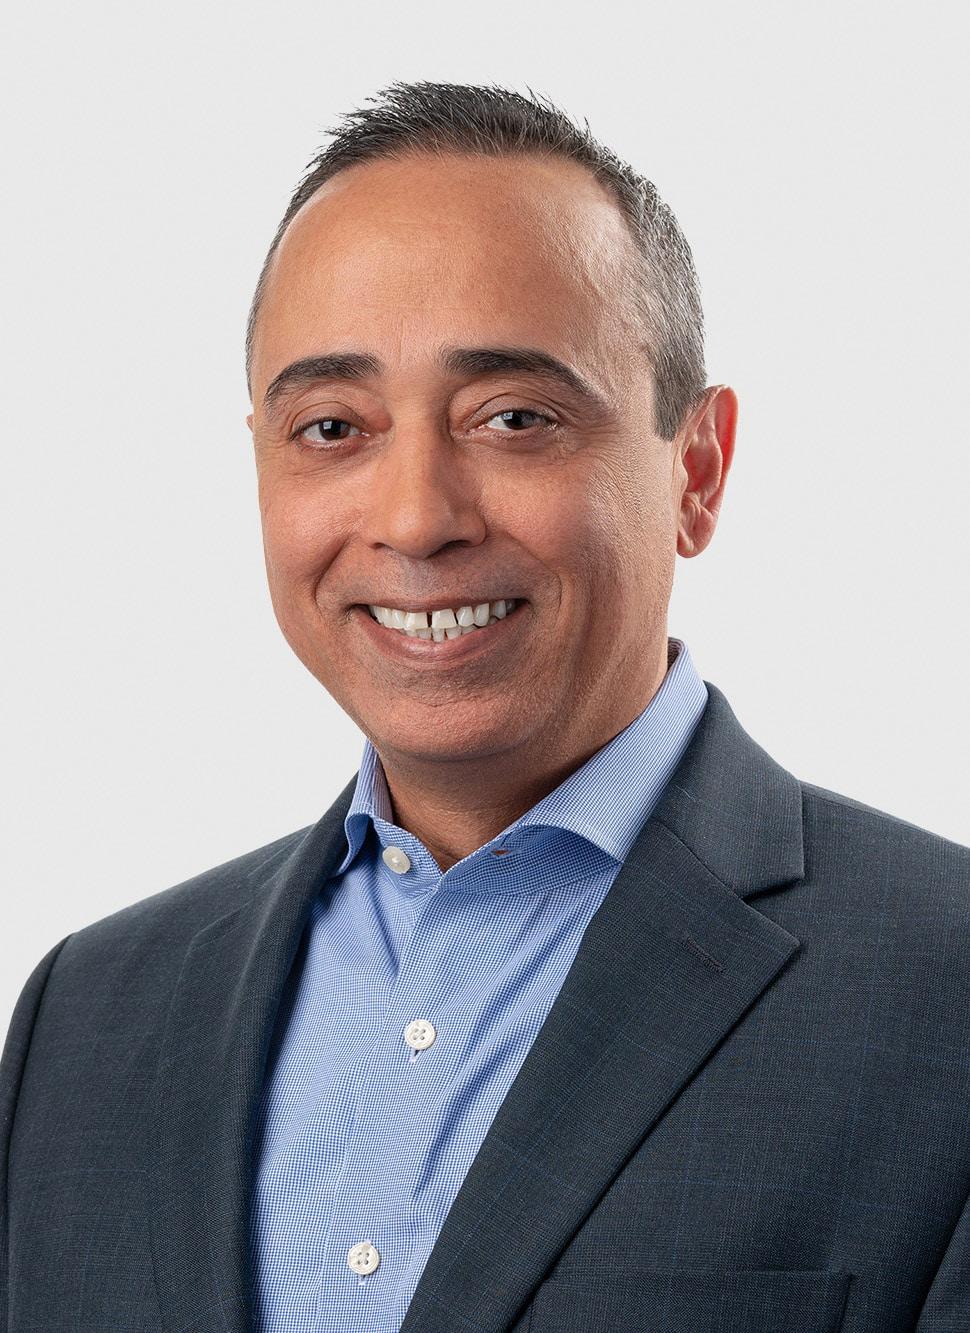 Michael Rosales Headshot